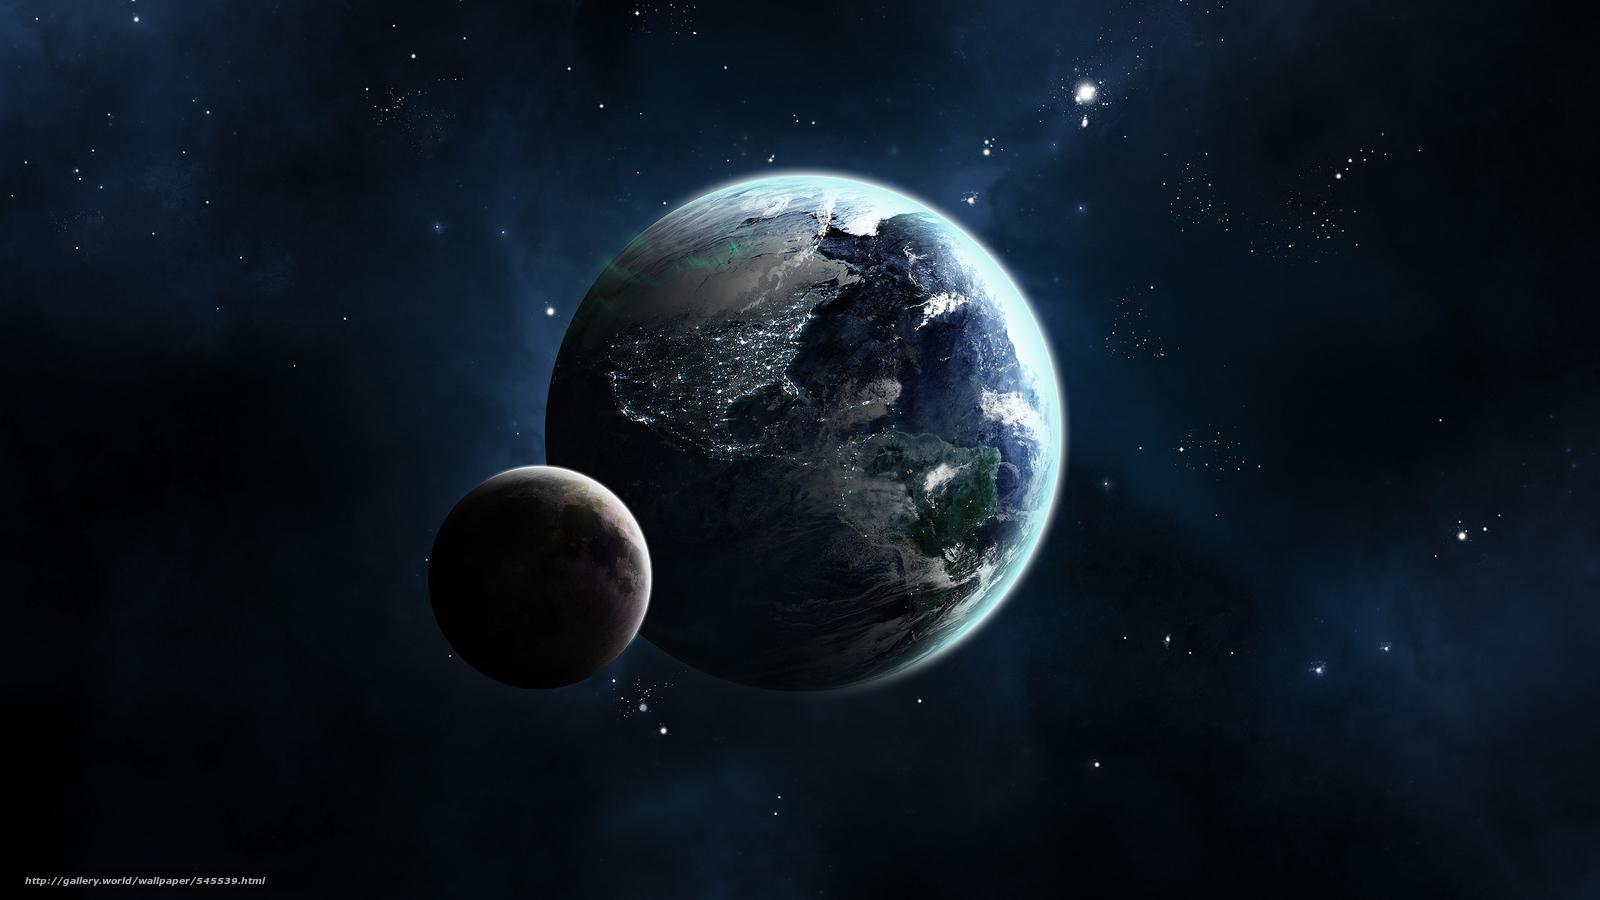 space wallpaper 2560x1440